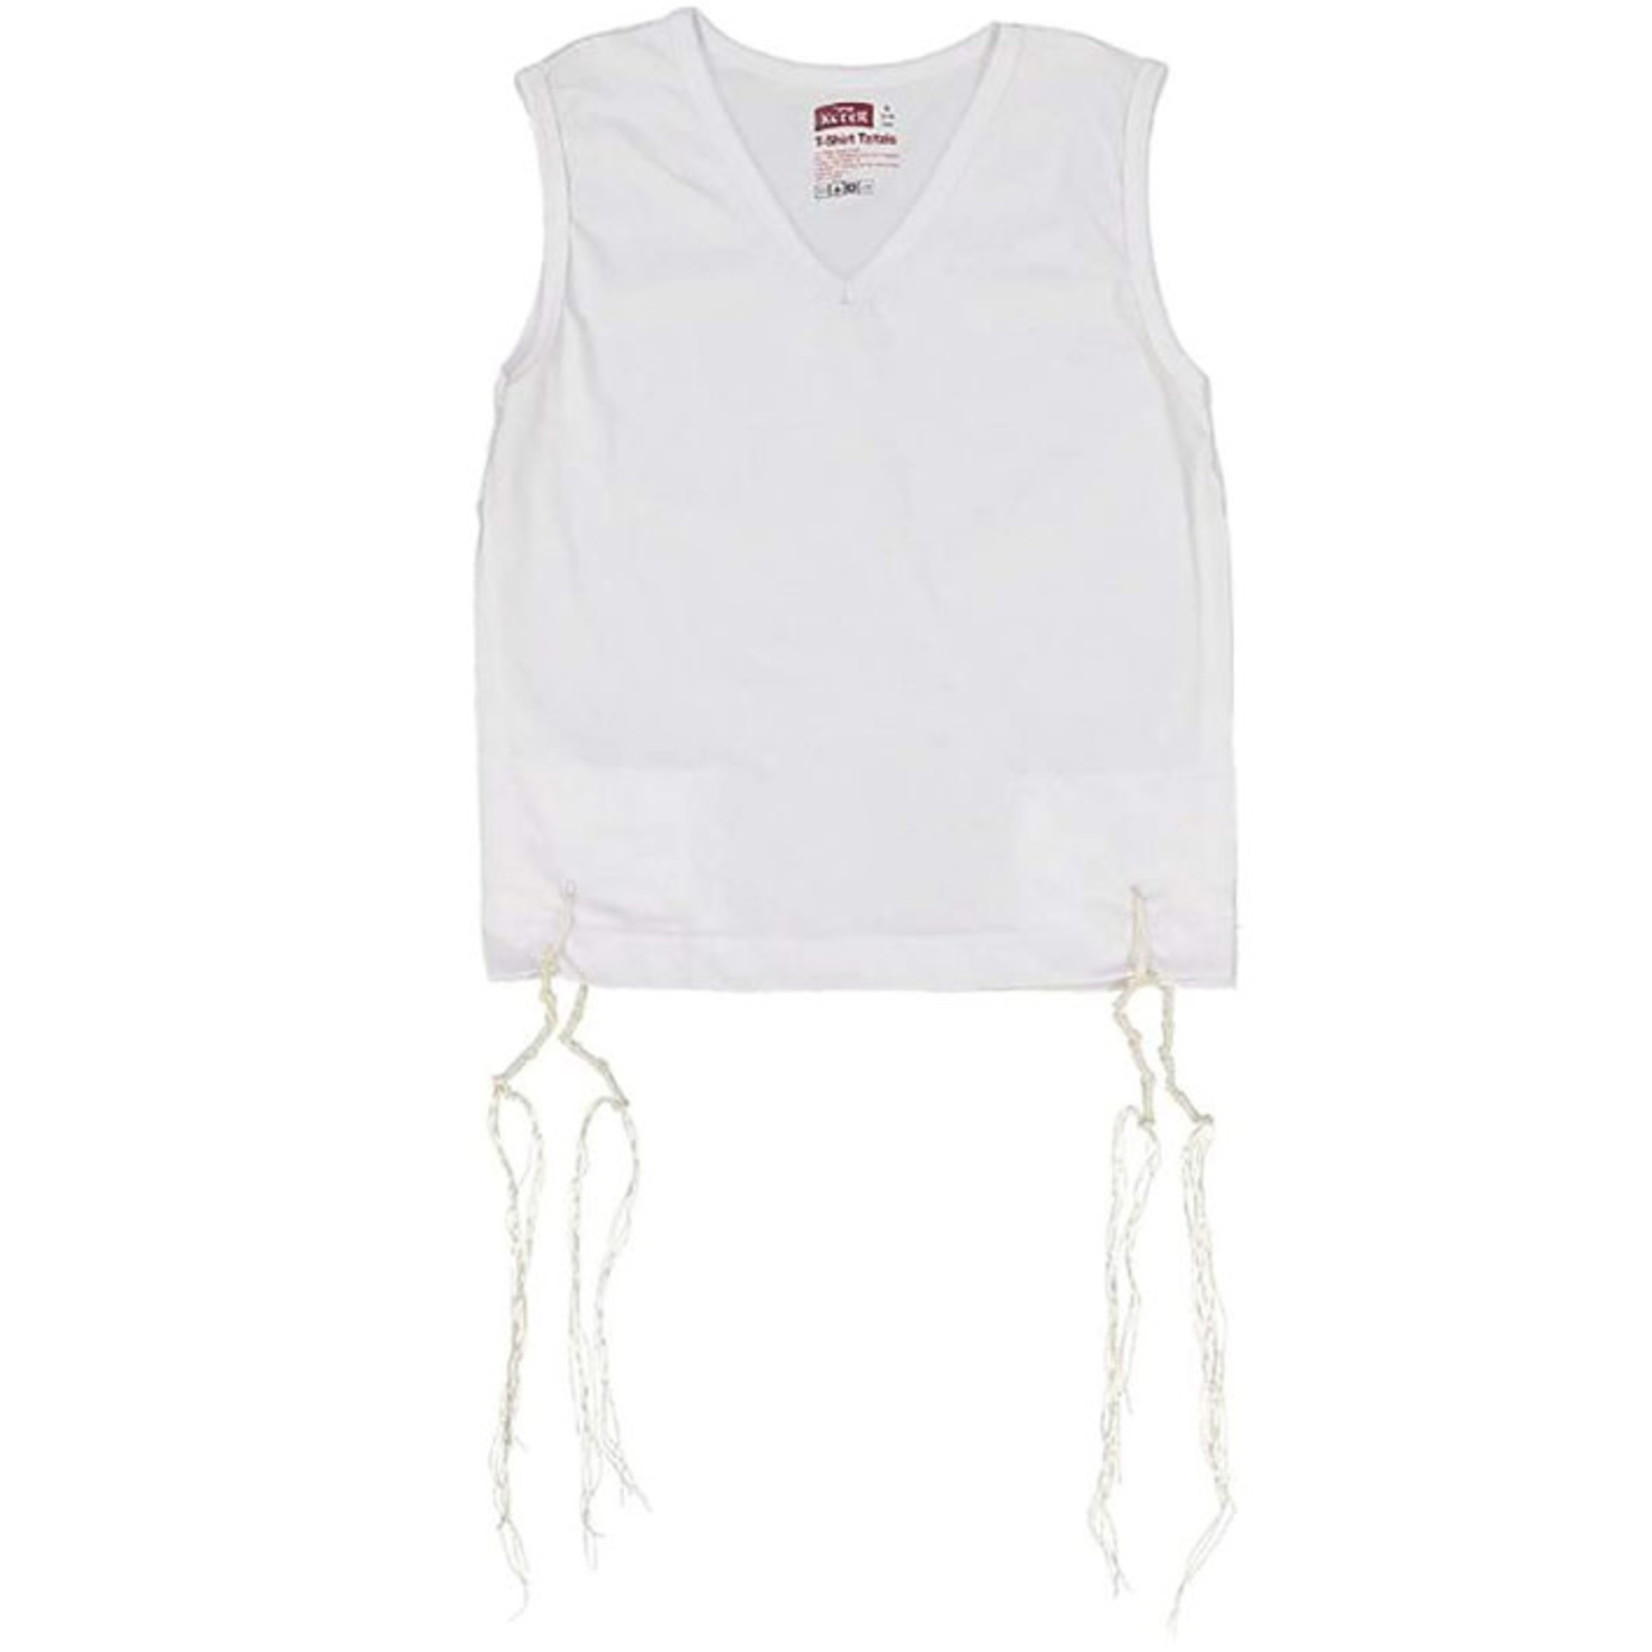 Undershirt-Style Arbah Kanfot, 100% Cotton, V-Neck, Size XL